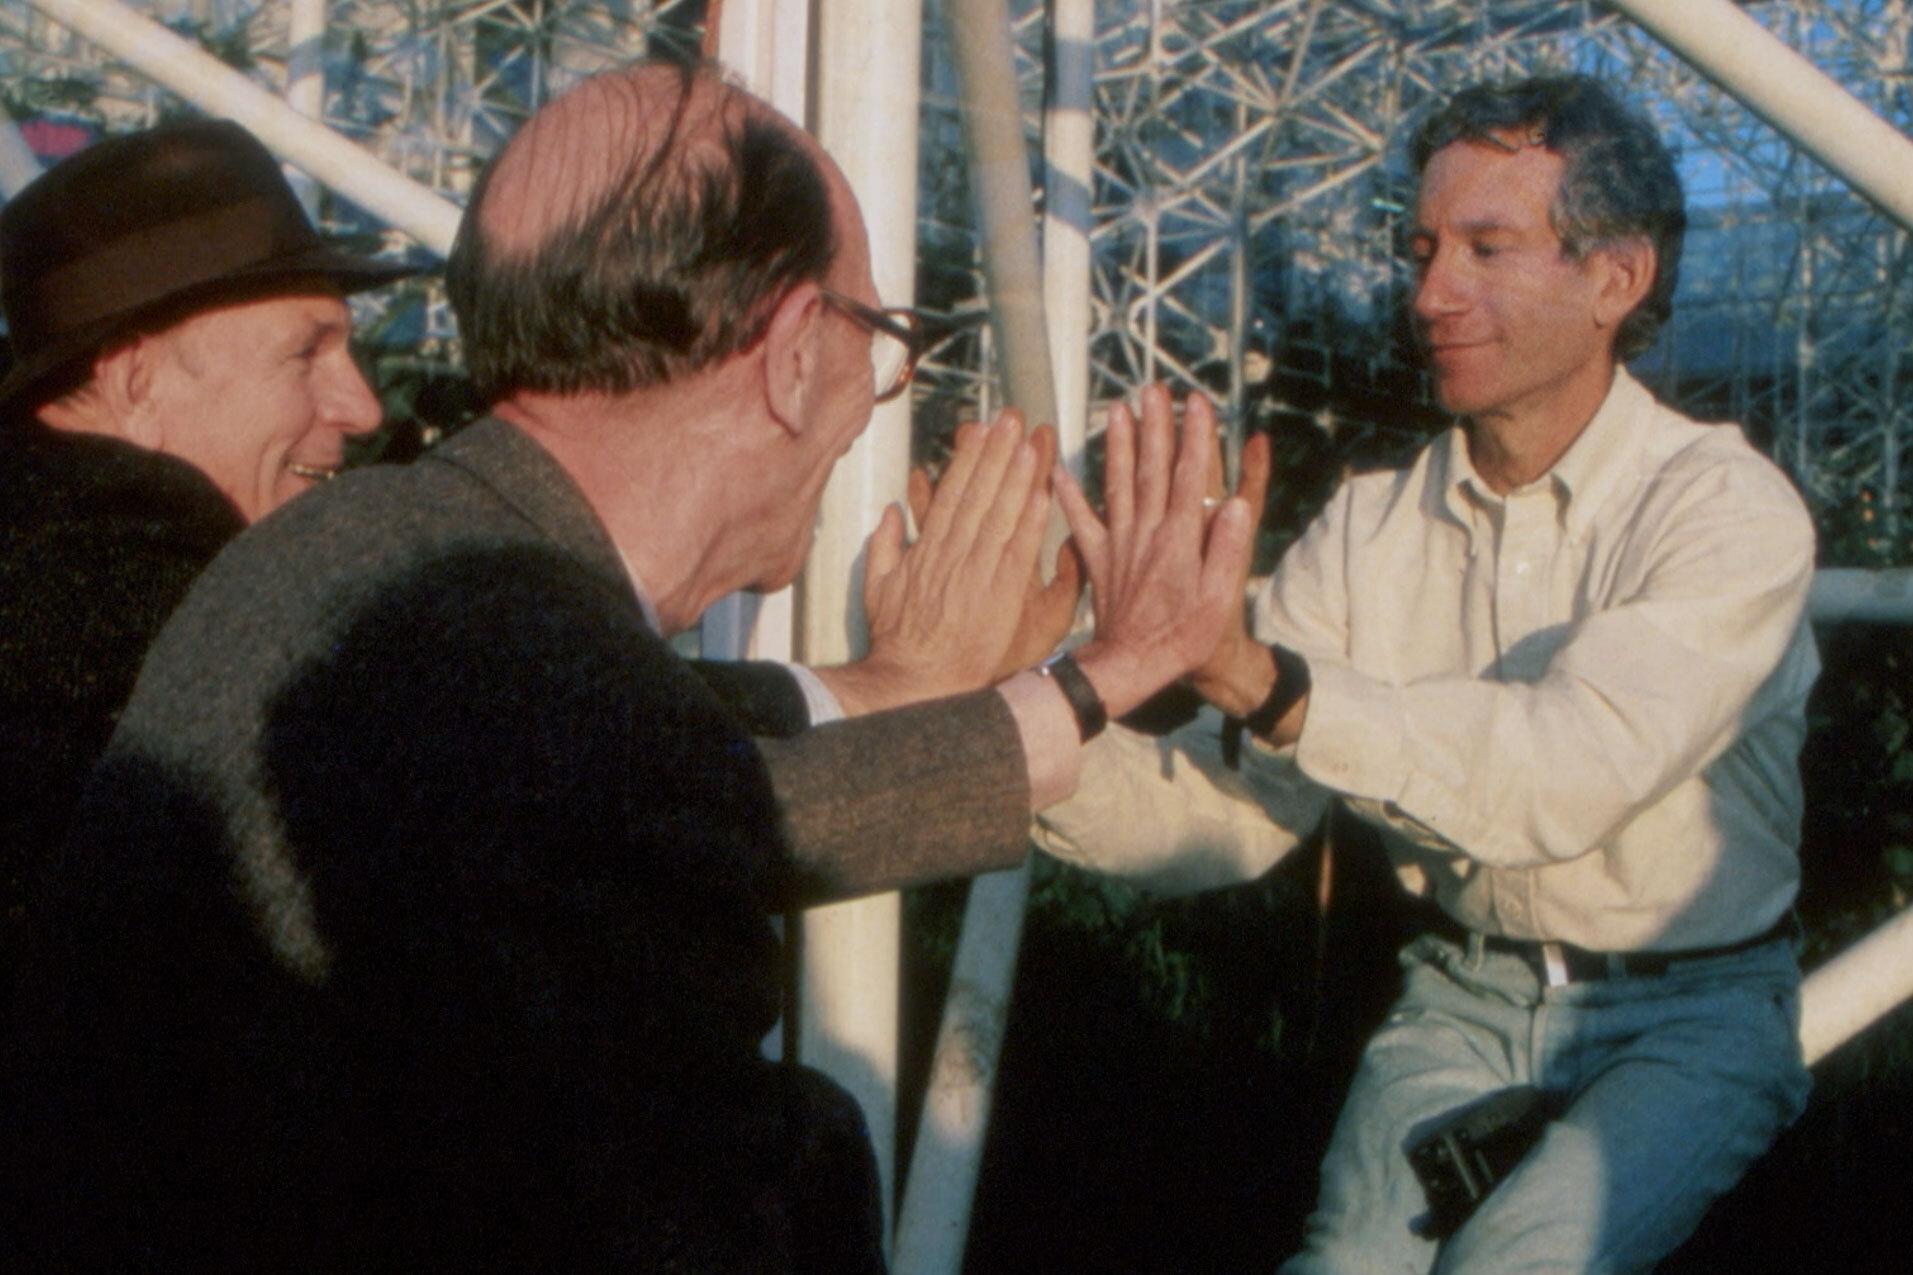 John Allen greets biospherian and ecologist Mark Nelson